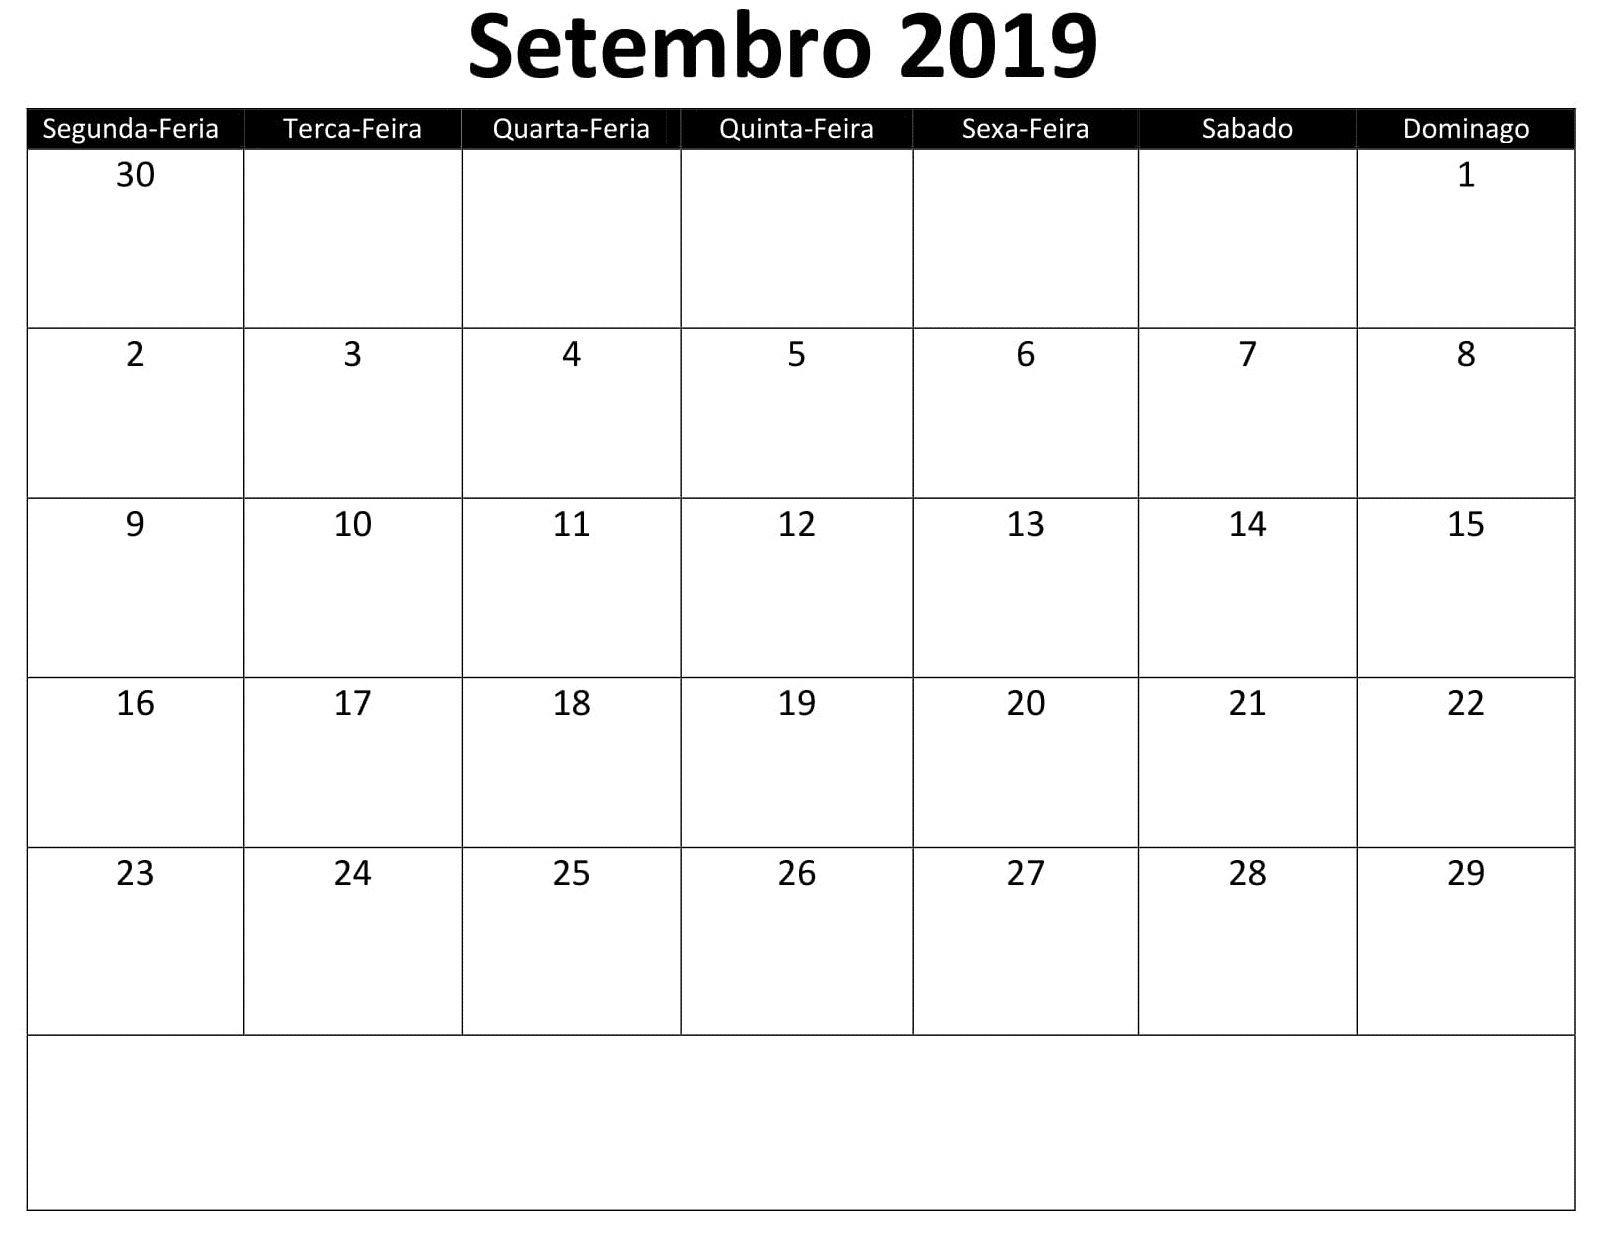 Calendario De Feriados 2019 Para Imprimir Recientes Maio Calendário Mesa 2019 Para Imprimir Of Calendario De Feriados 2019 Para Imprimir Más Caliente Este Es Sin Duda Calendario 2019 E Os Feriados